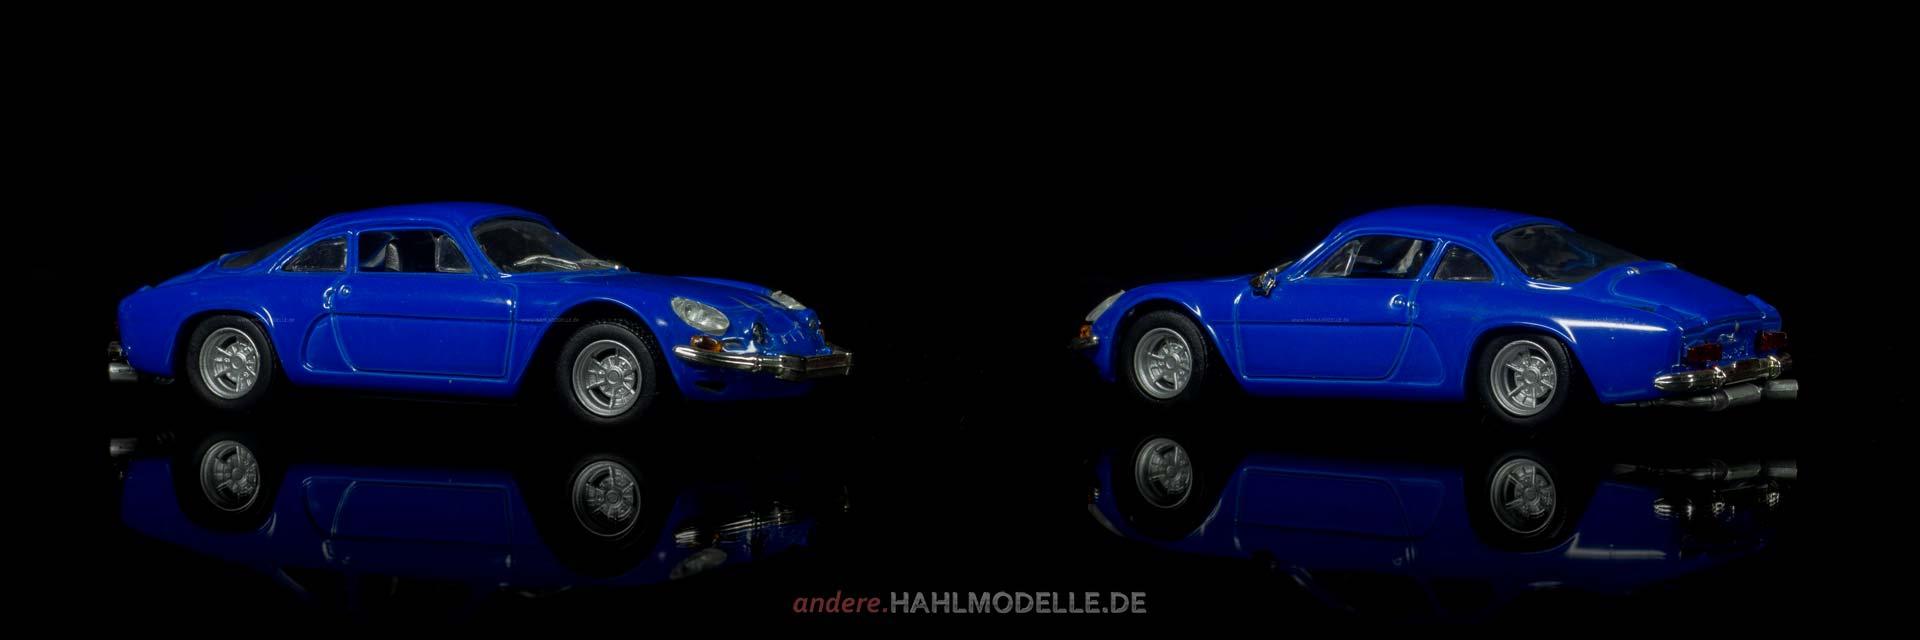 Renault Alpine A 110 | Coupé | Ixo | 1:43 | www.andere.hahlmodelle.de